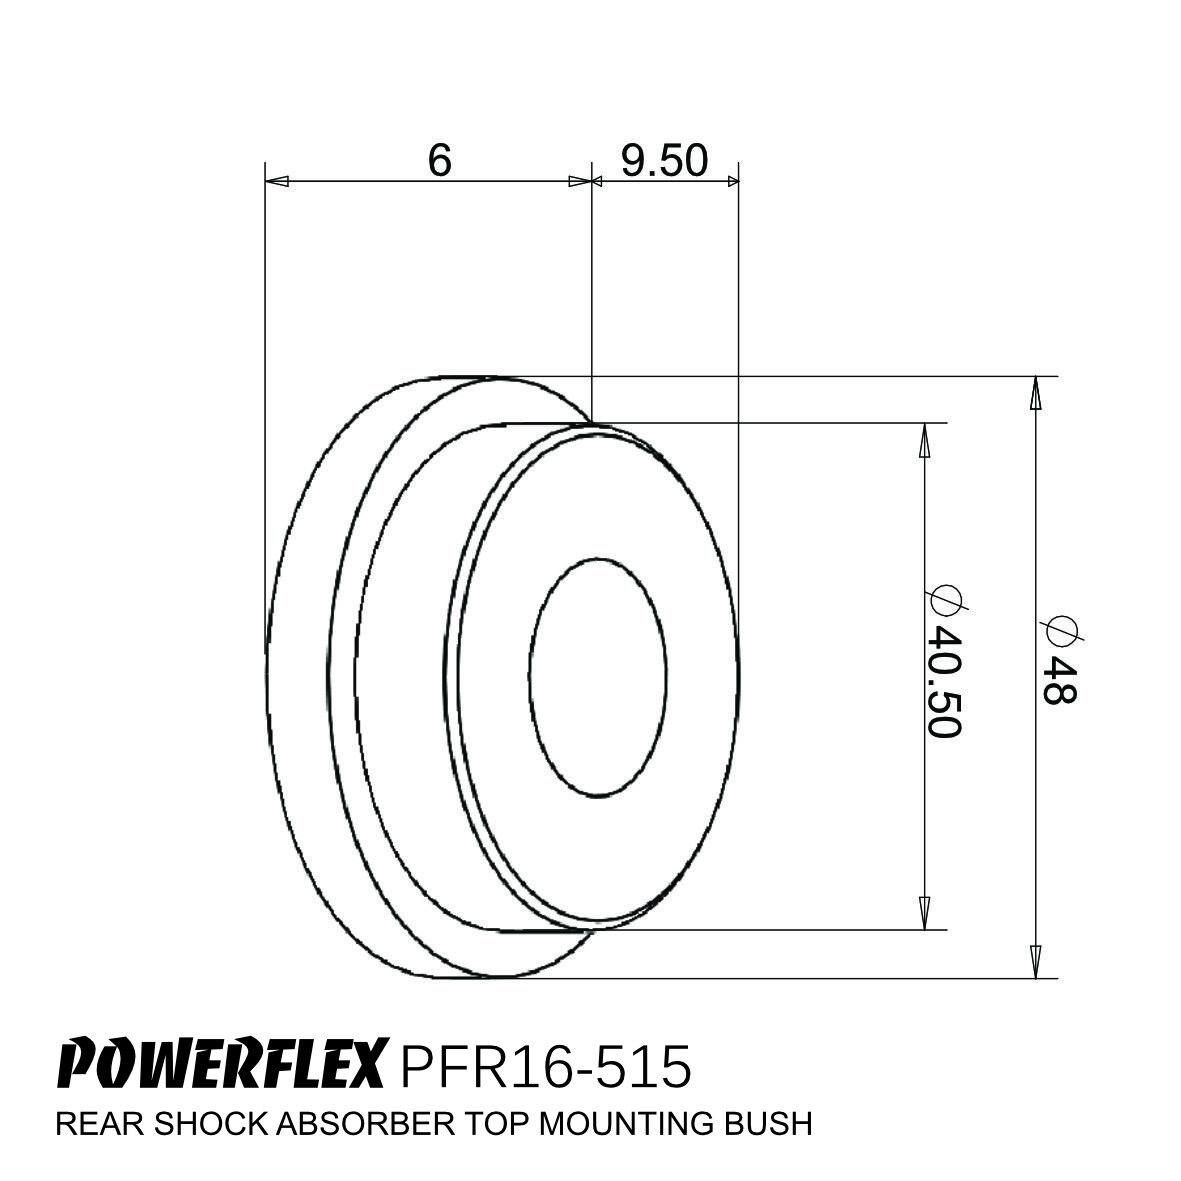 PFR16-515 POWERFLEX ROAD SERIES Rear Shock Absorber Top Mounting Bushes